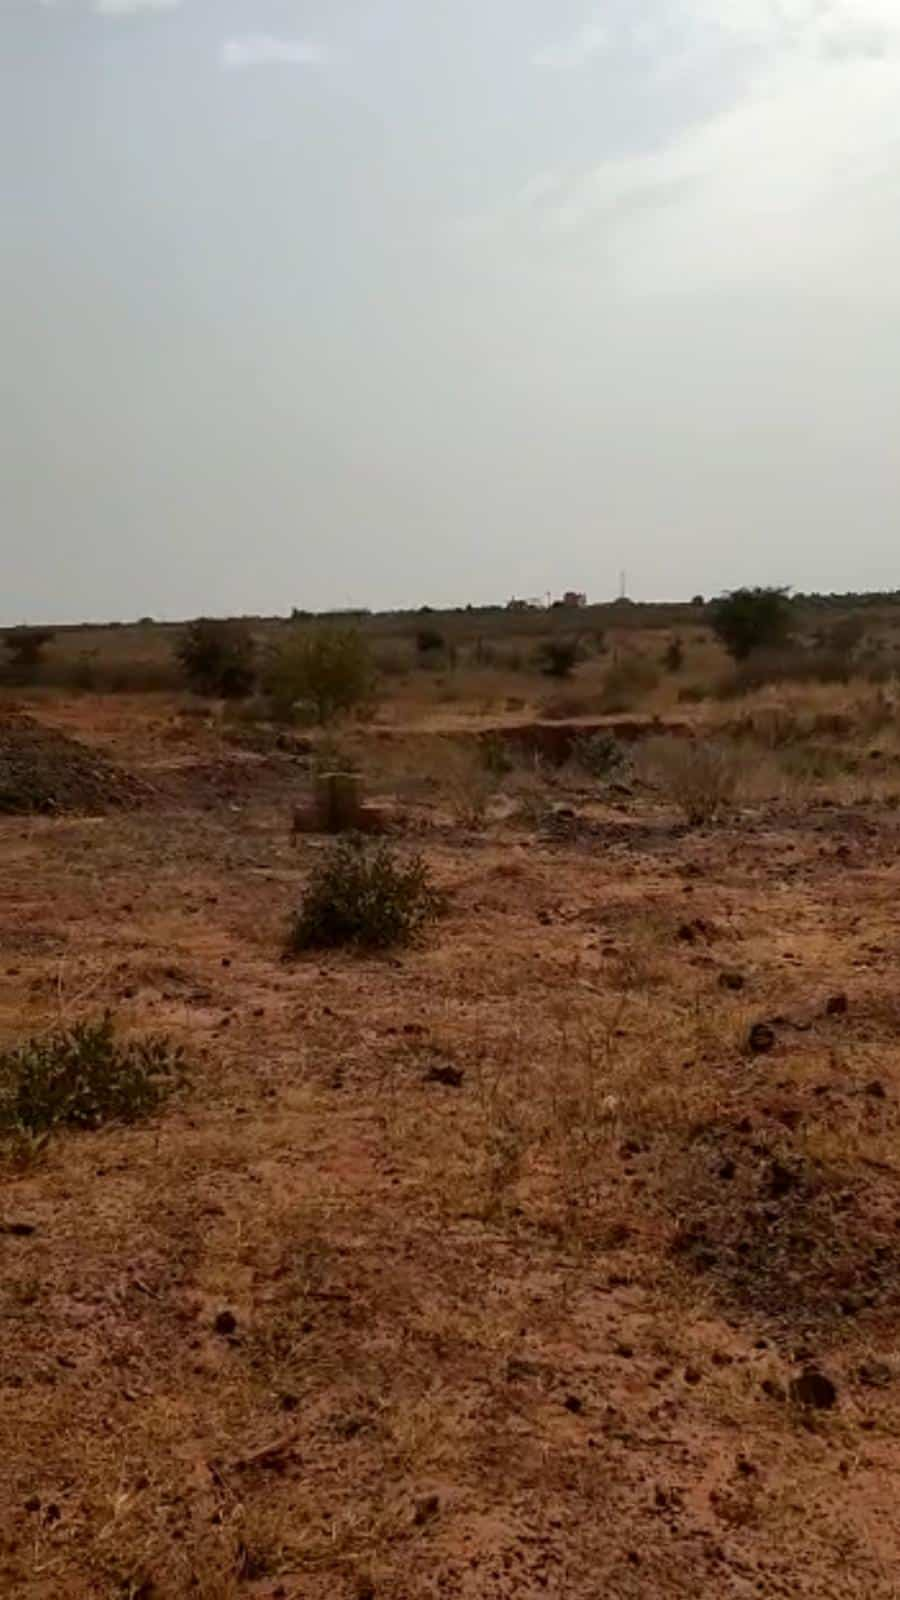 Terrain de 300m2 à vendre à Sindian